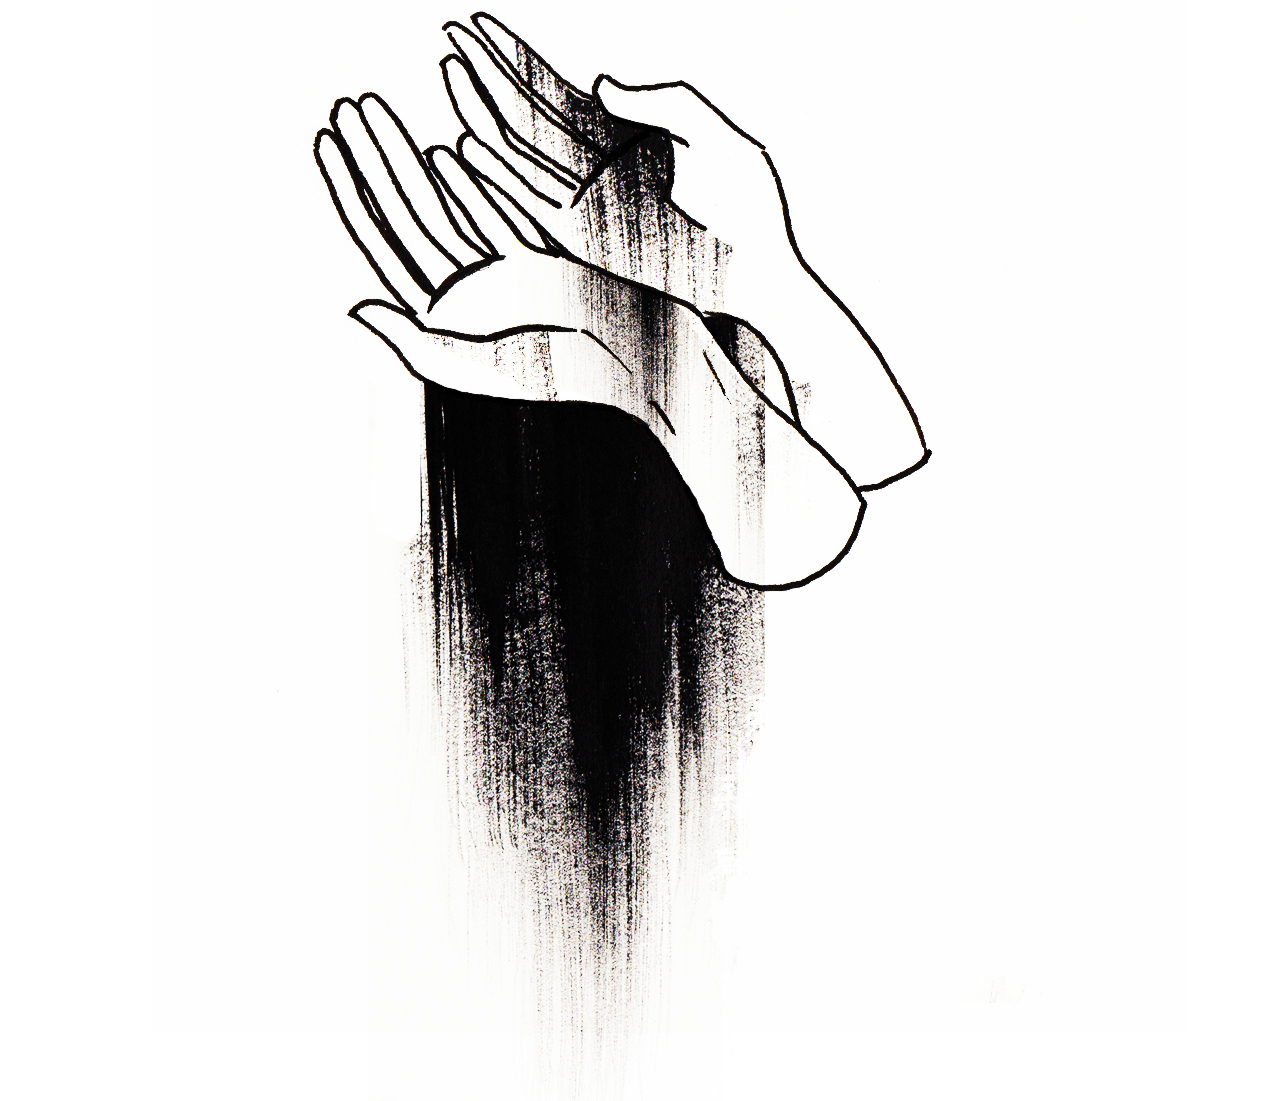 Illustration by M. Laverick (Momalish)